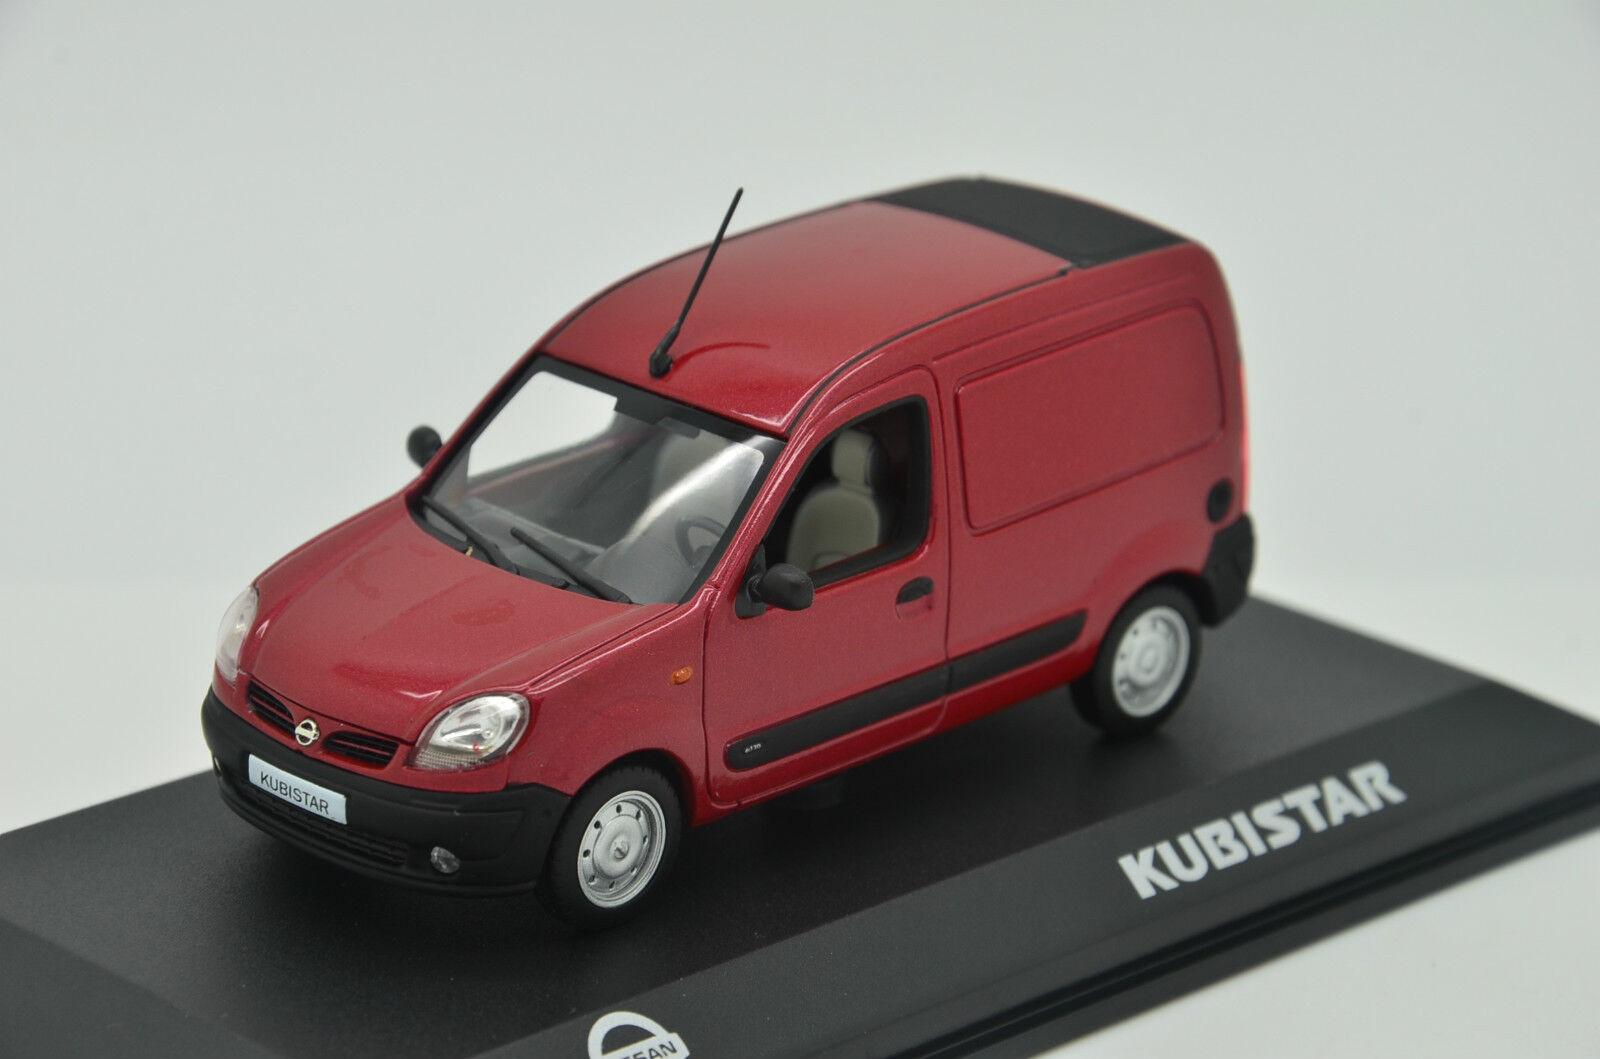 Rare     Nissan Kubistar Norev 1 43